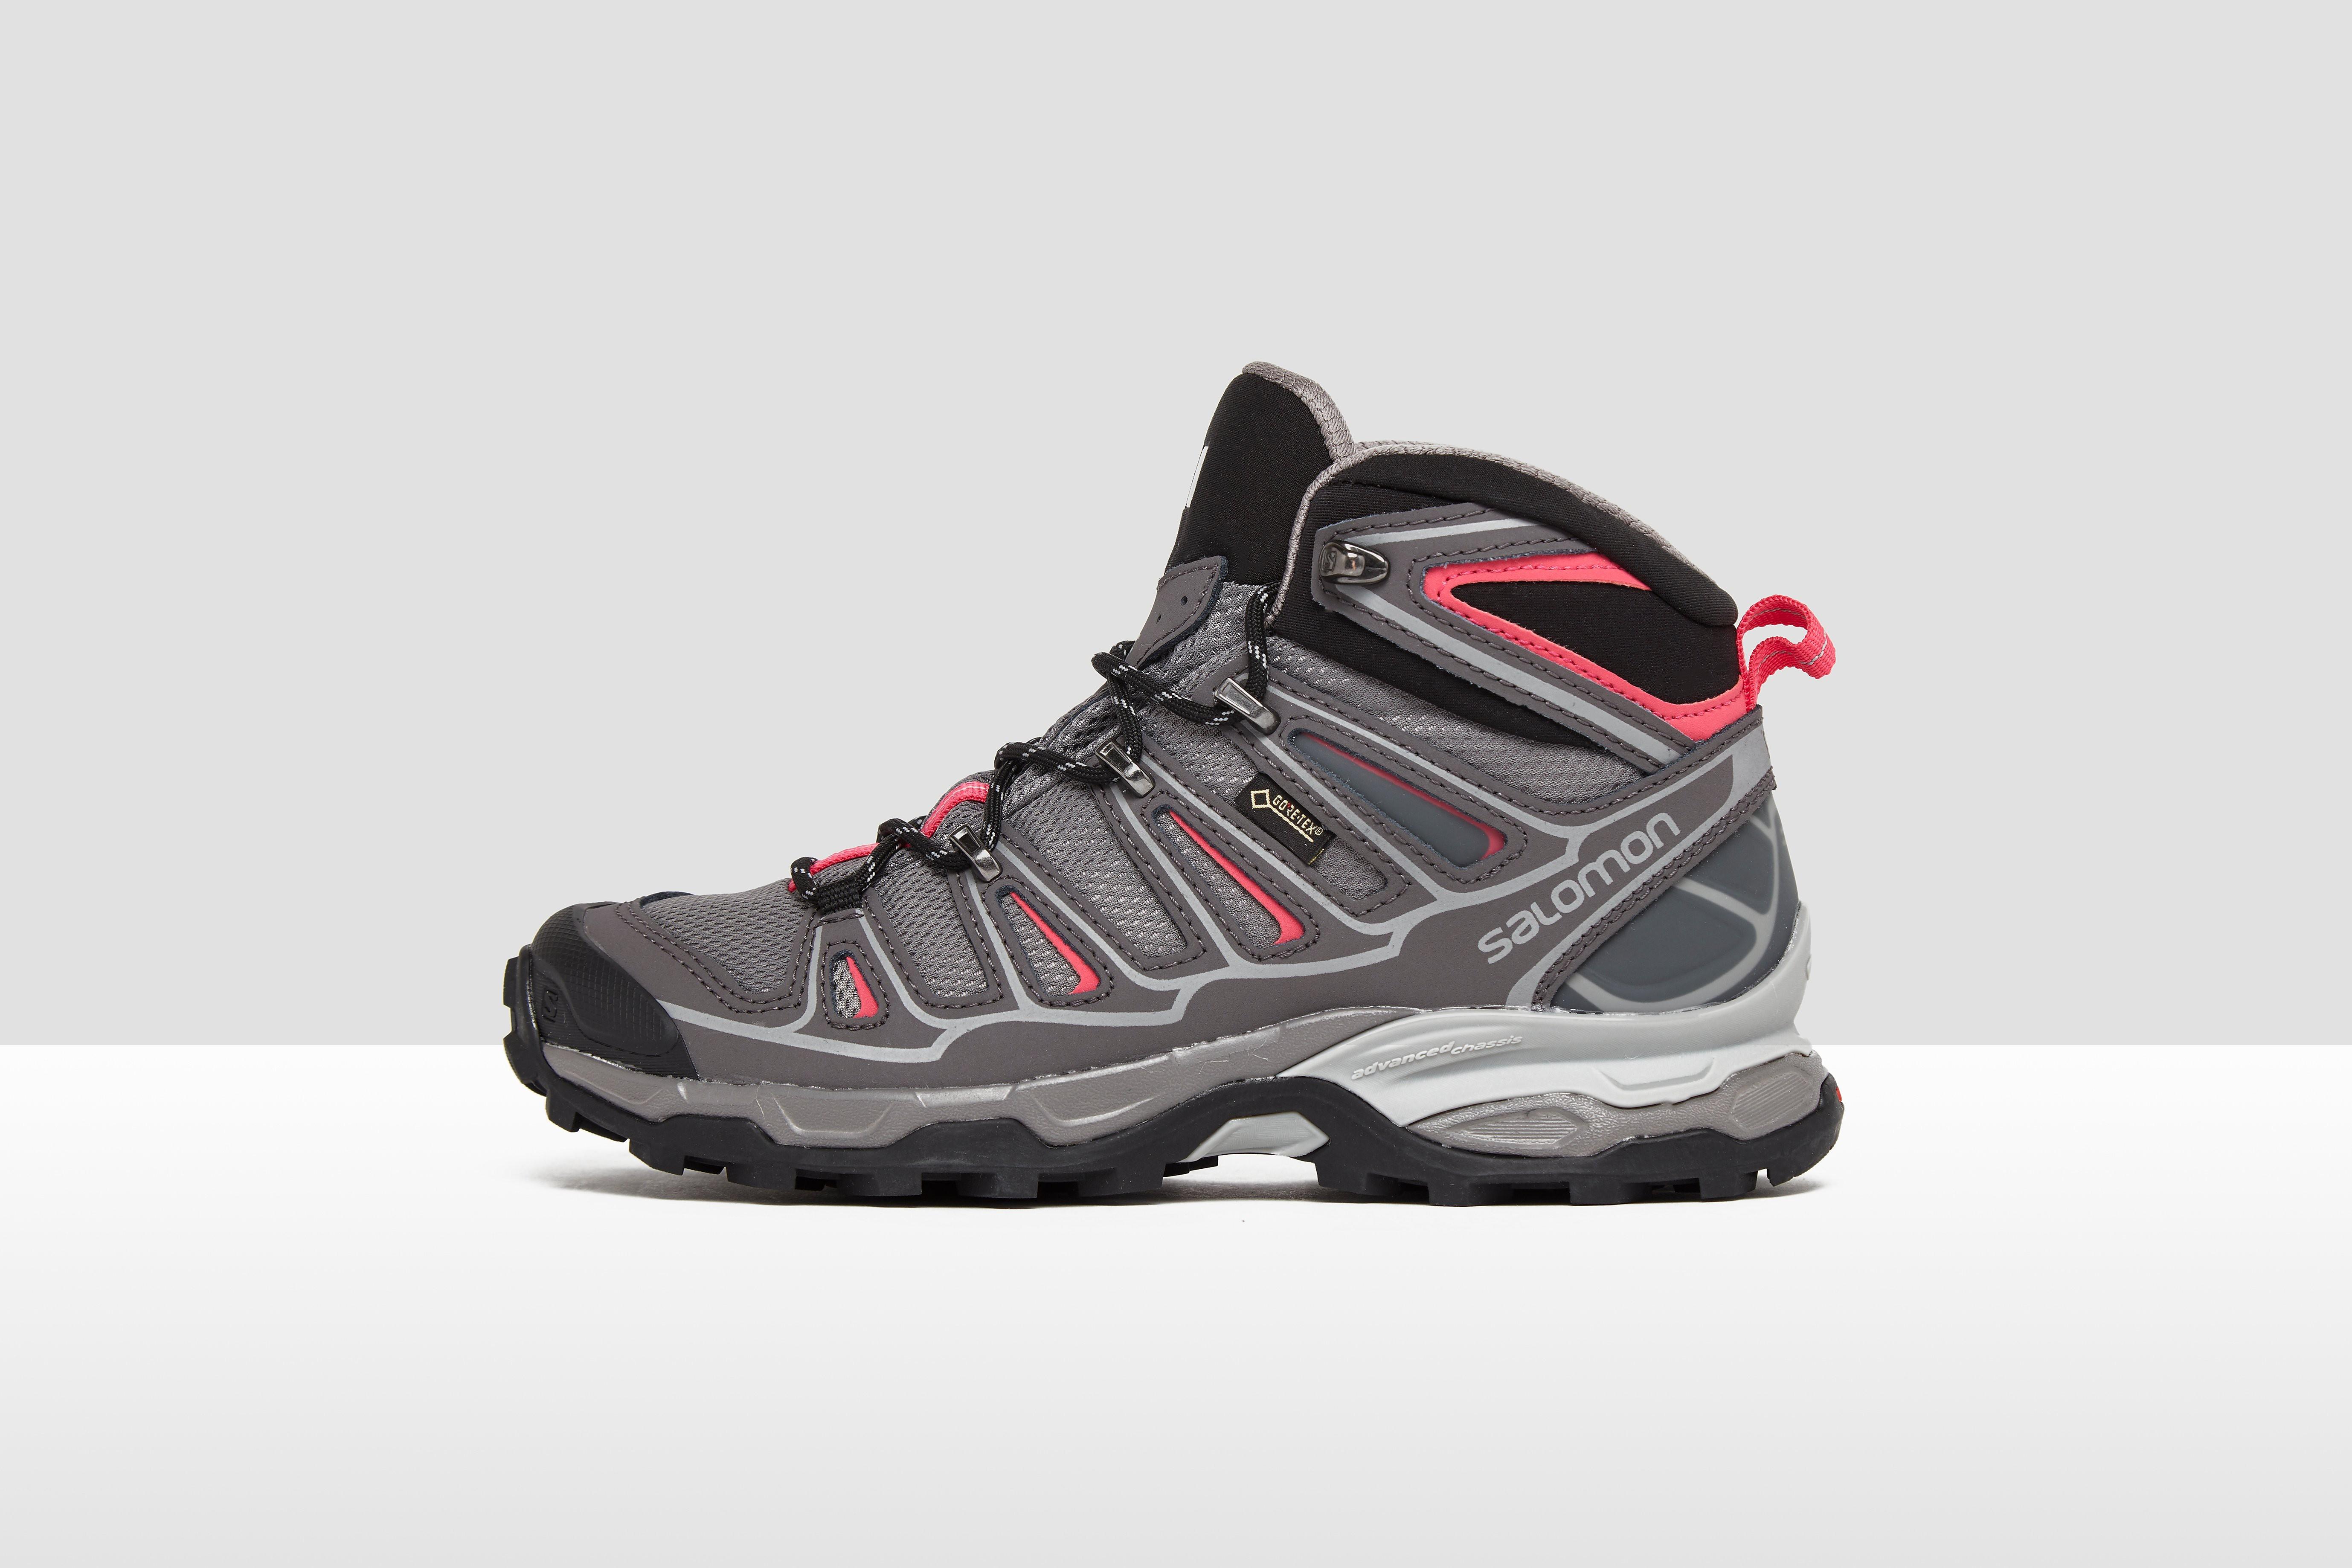 Salomon X Ultra Mid GTX Ladies Waking Boots